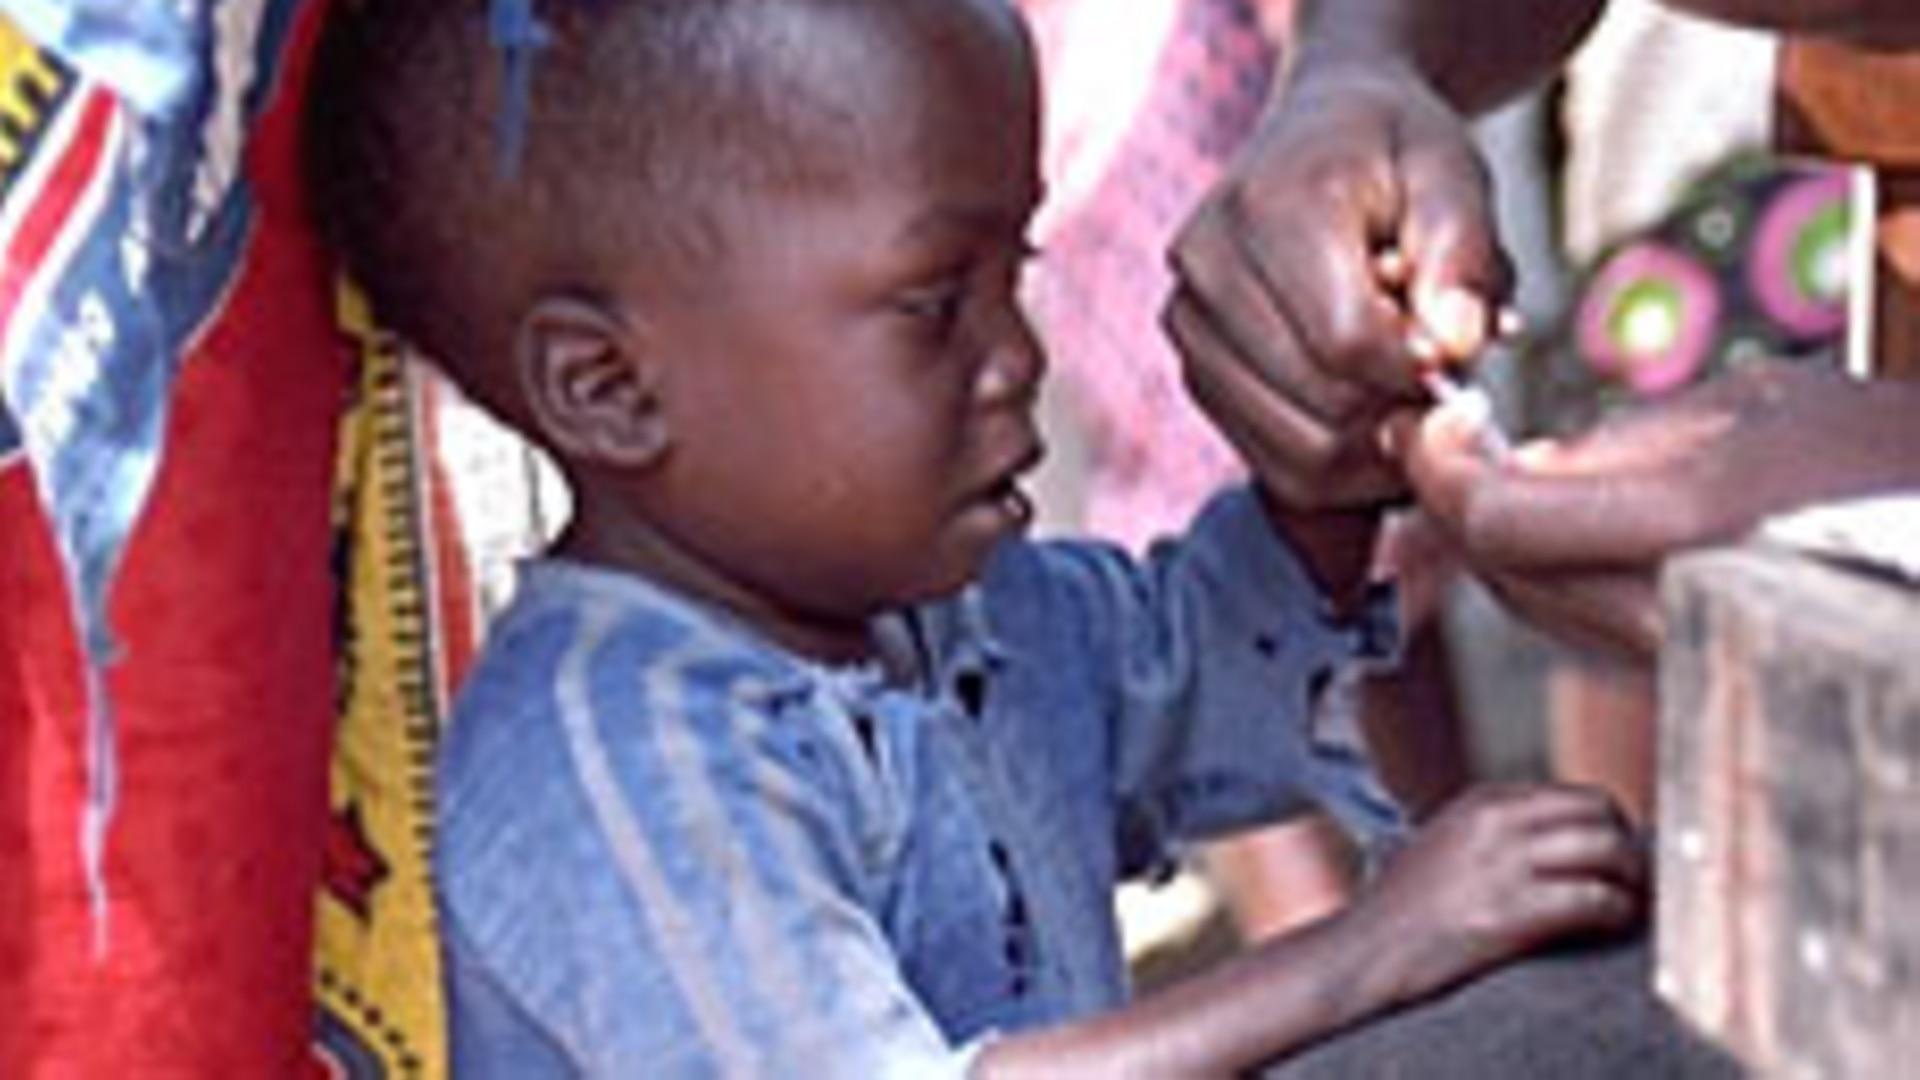 Malaria: the killer disease - SWI swissinfo.ch